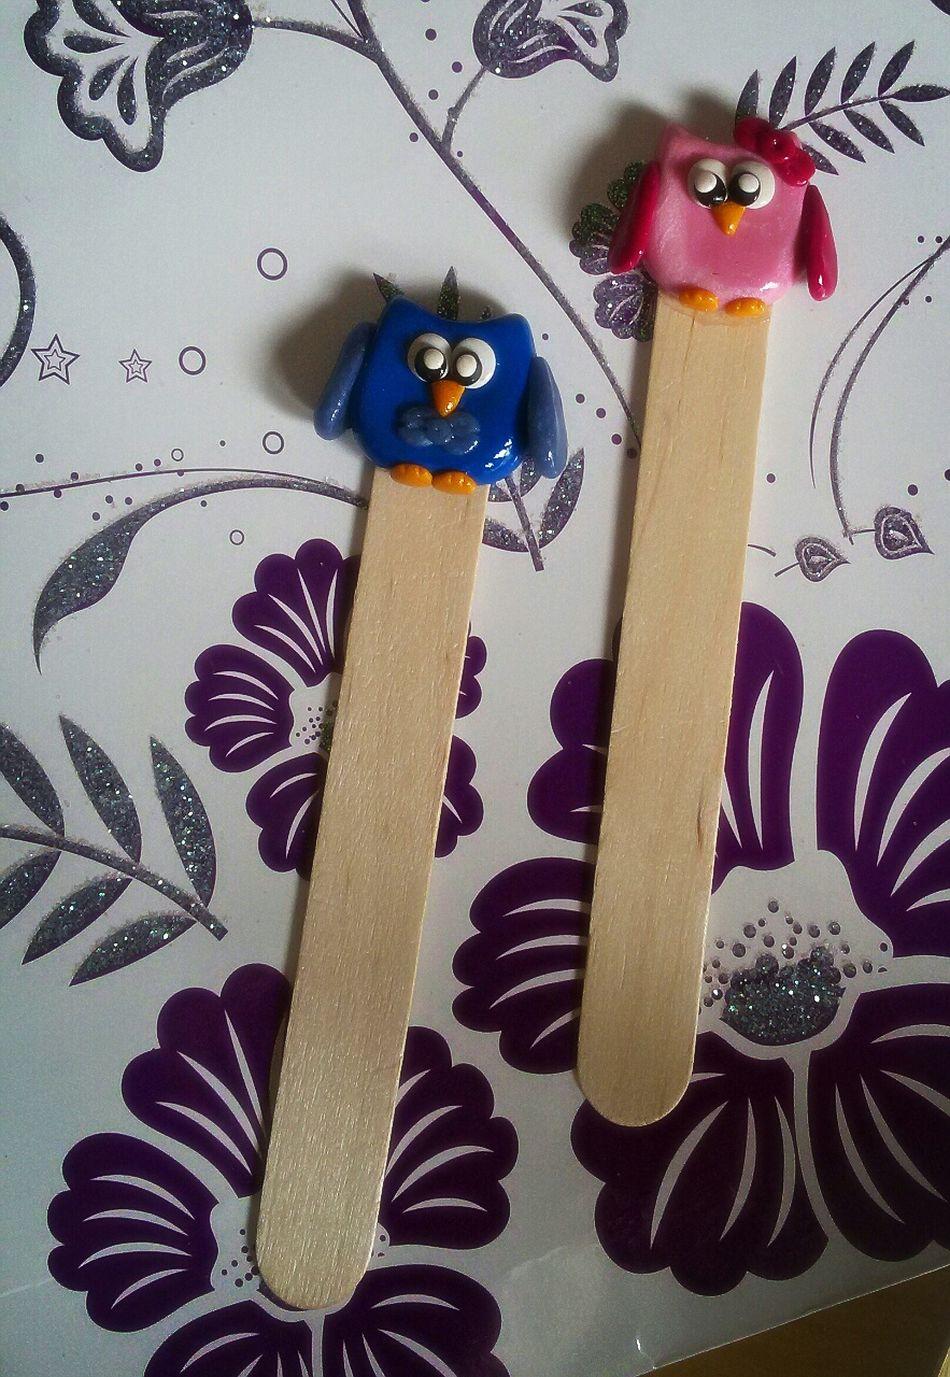 Handmade Polymerclay Fimolovers Fimo Owls Love ♥ Bookmarks